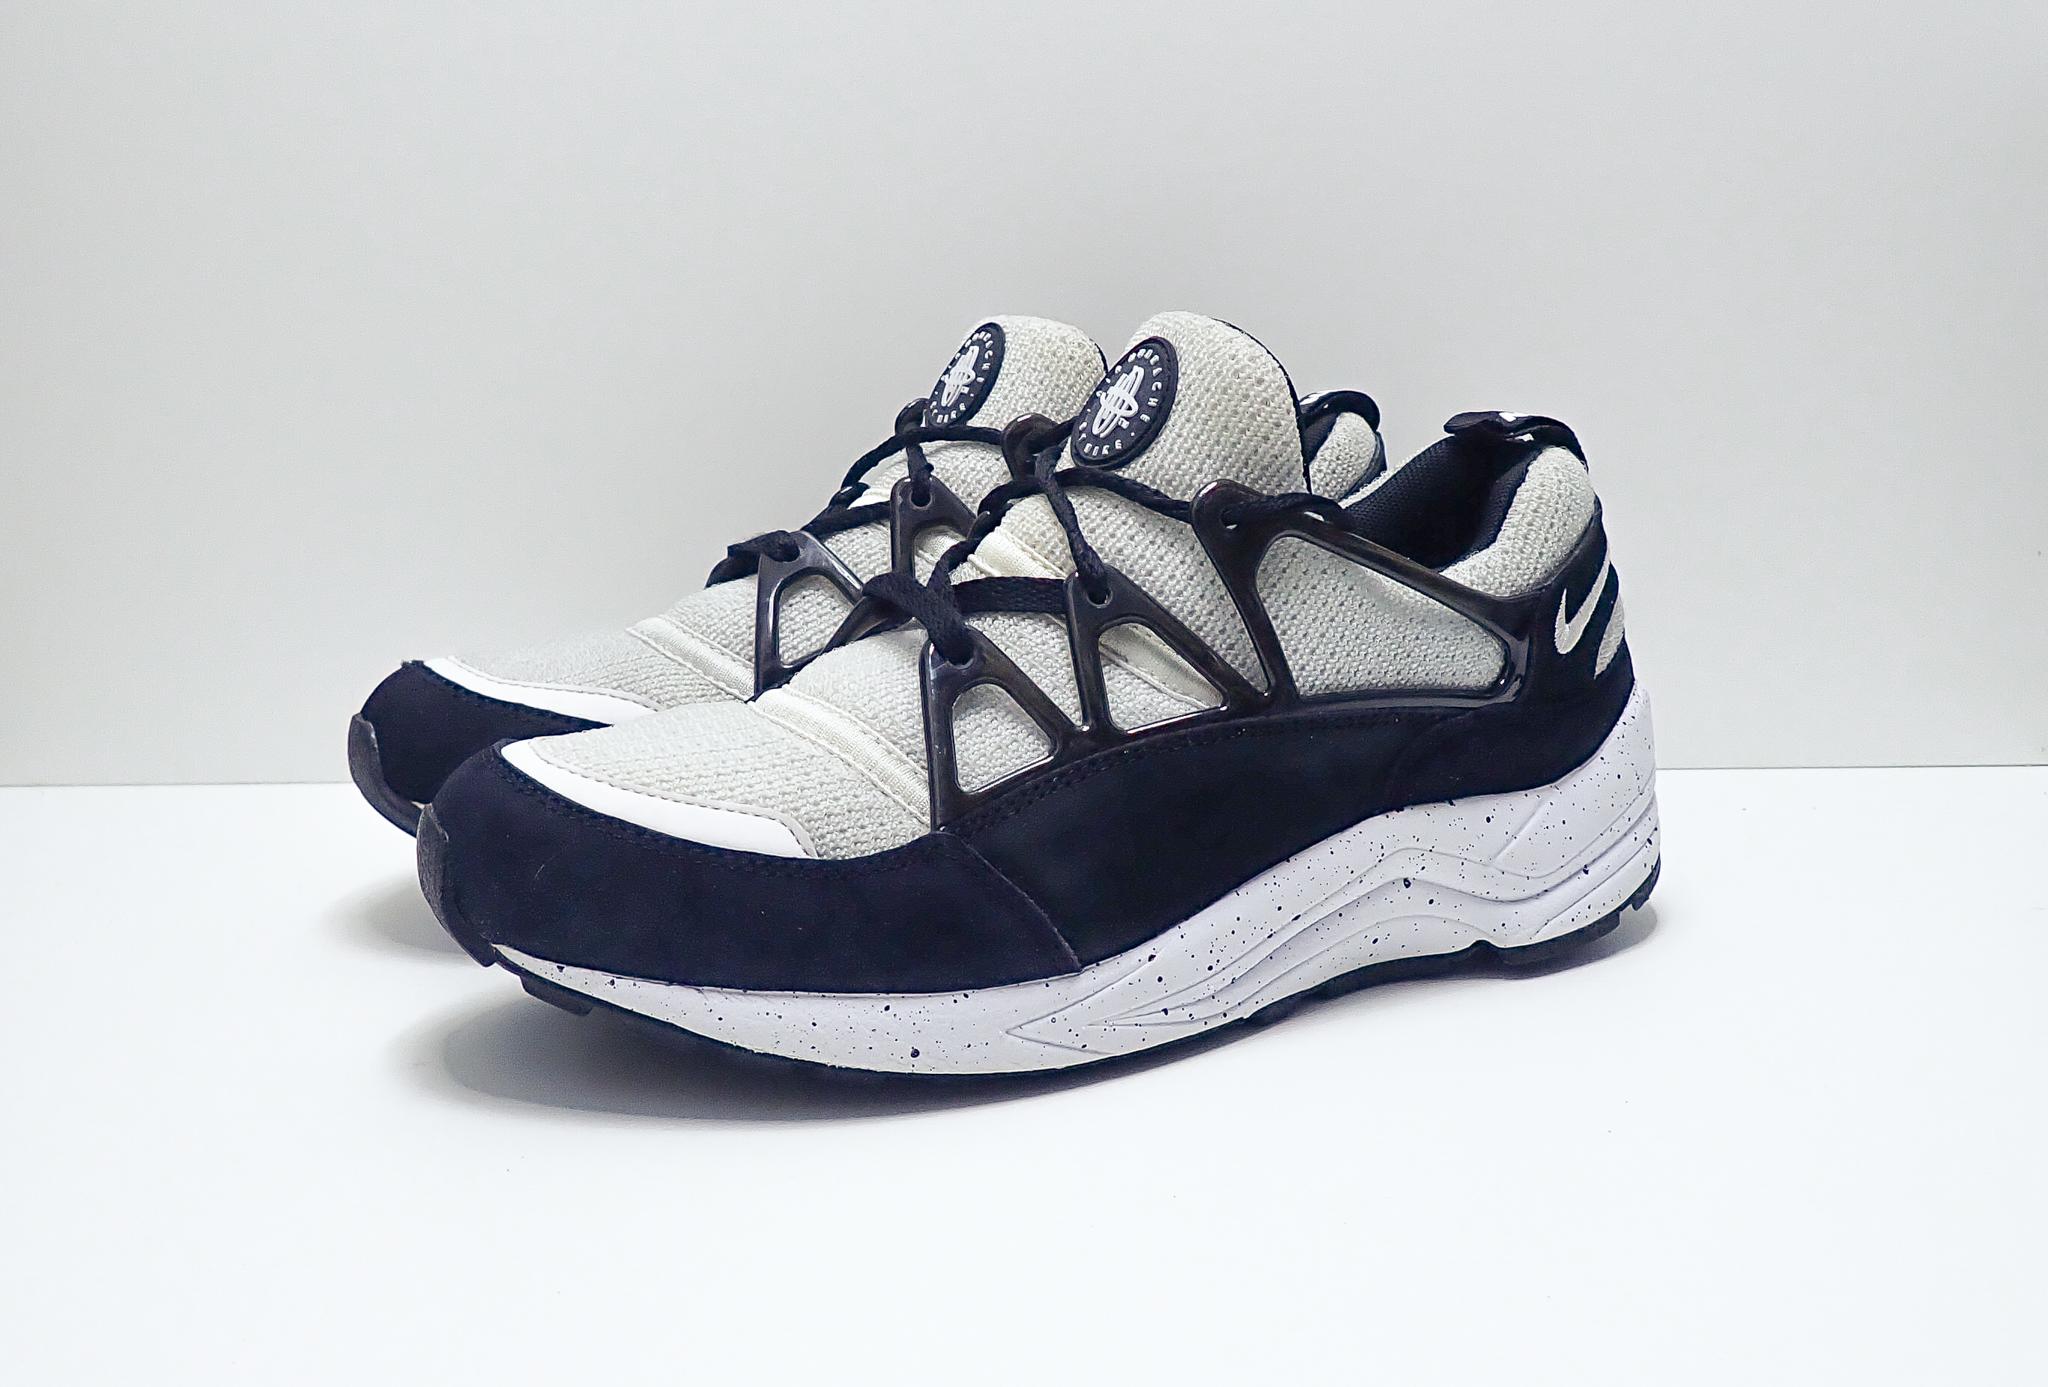 Nike Air Huarache Light Black White